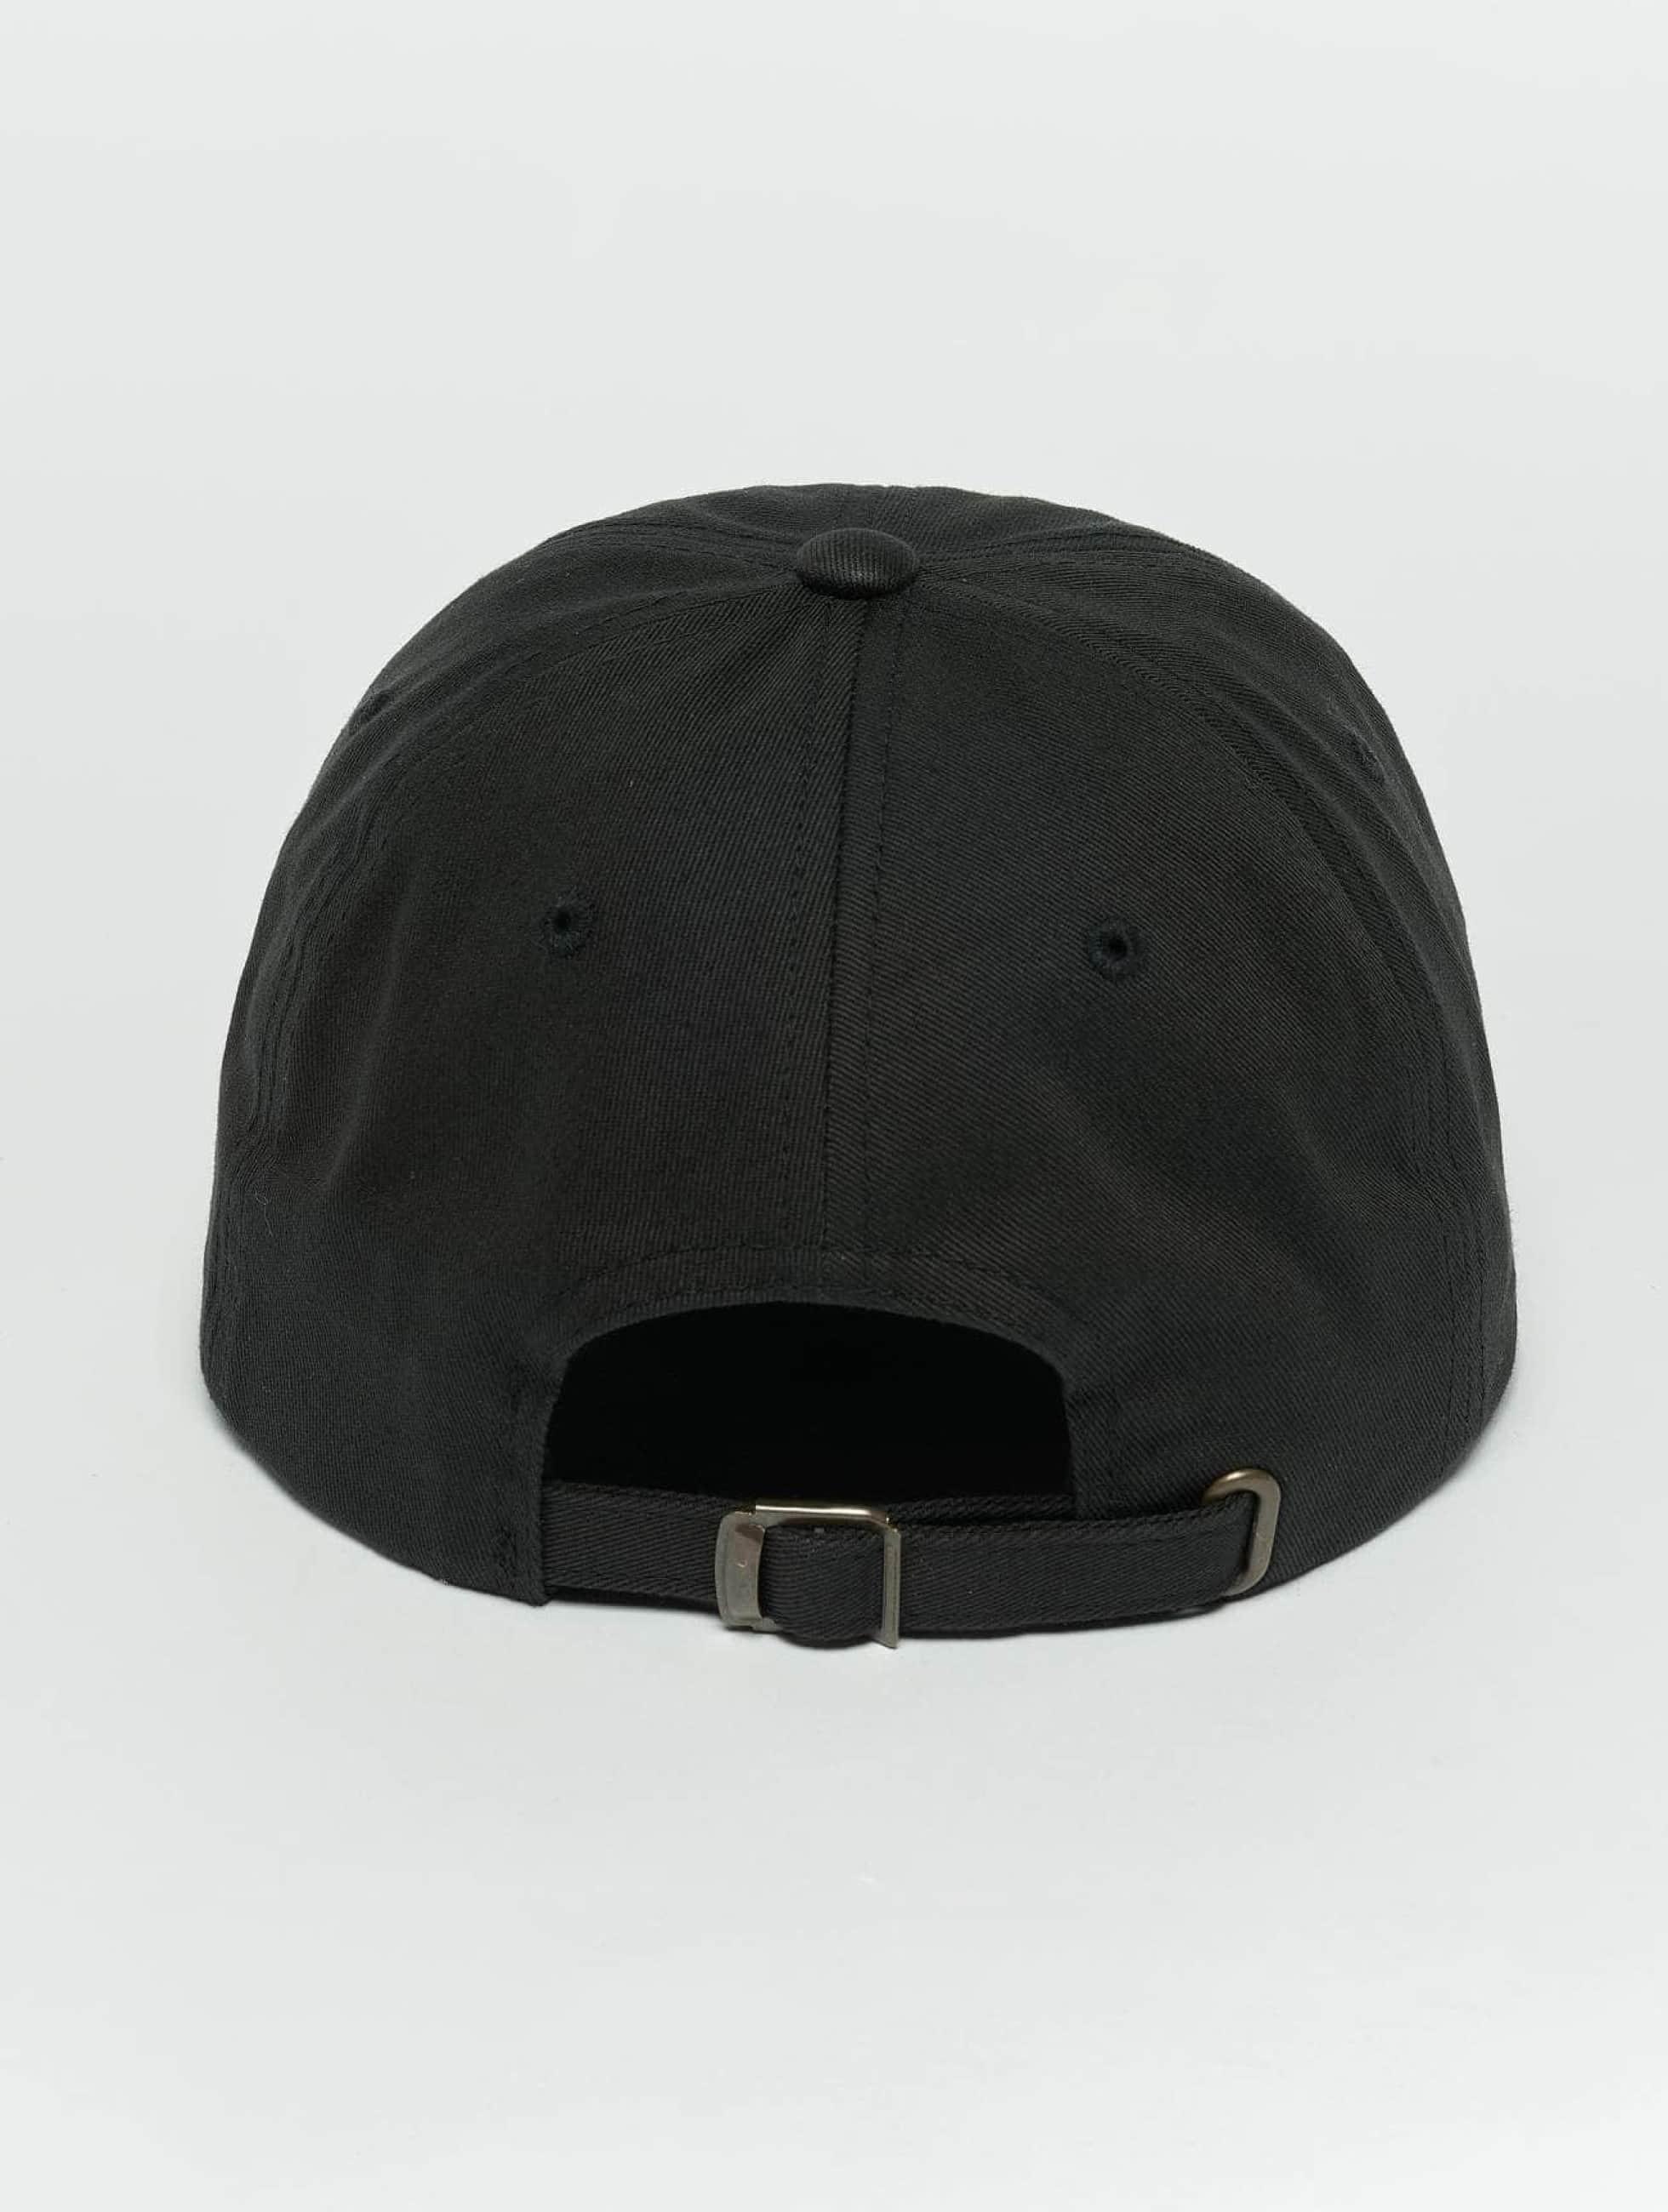 TurnUP Snapback Caps Disturbing sort